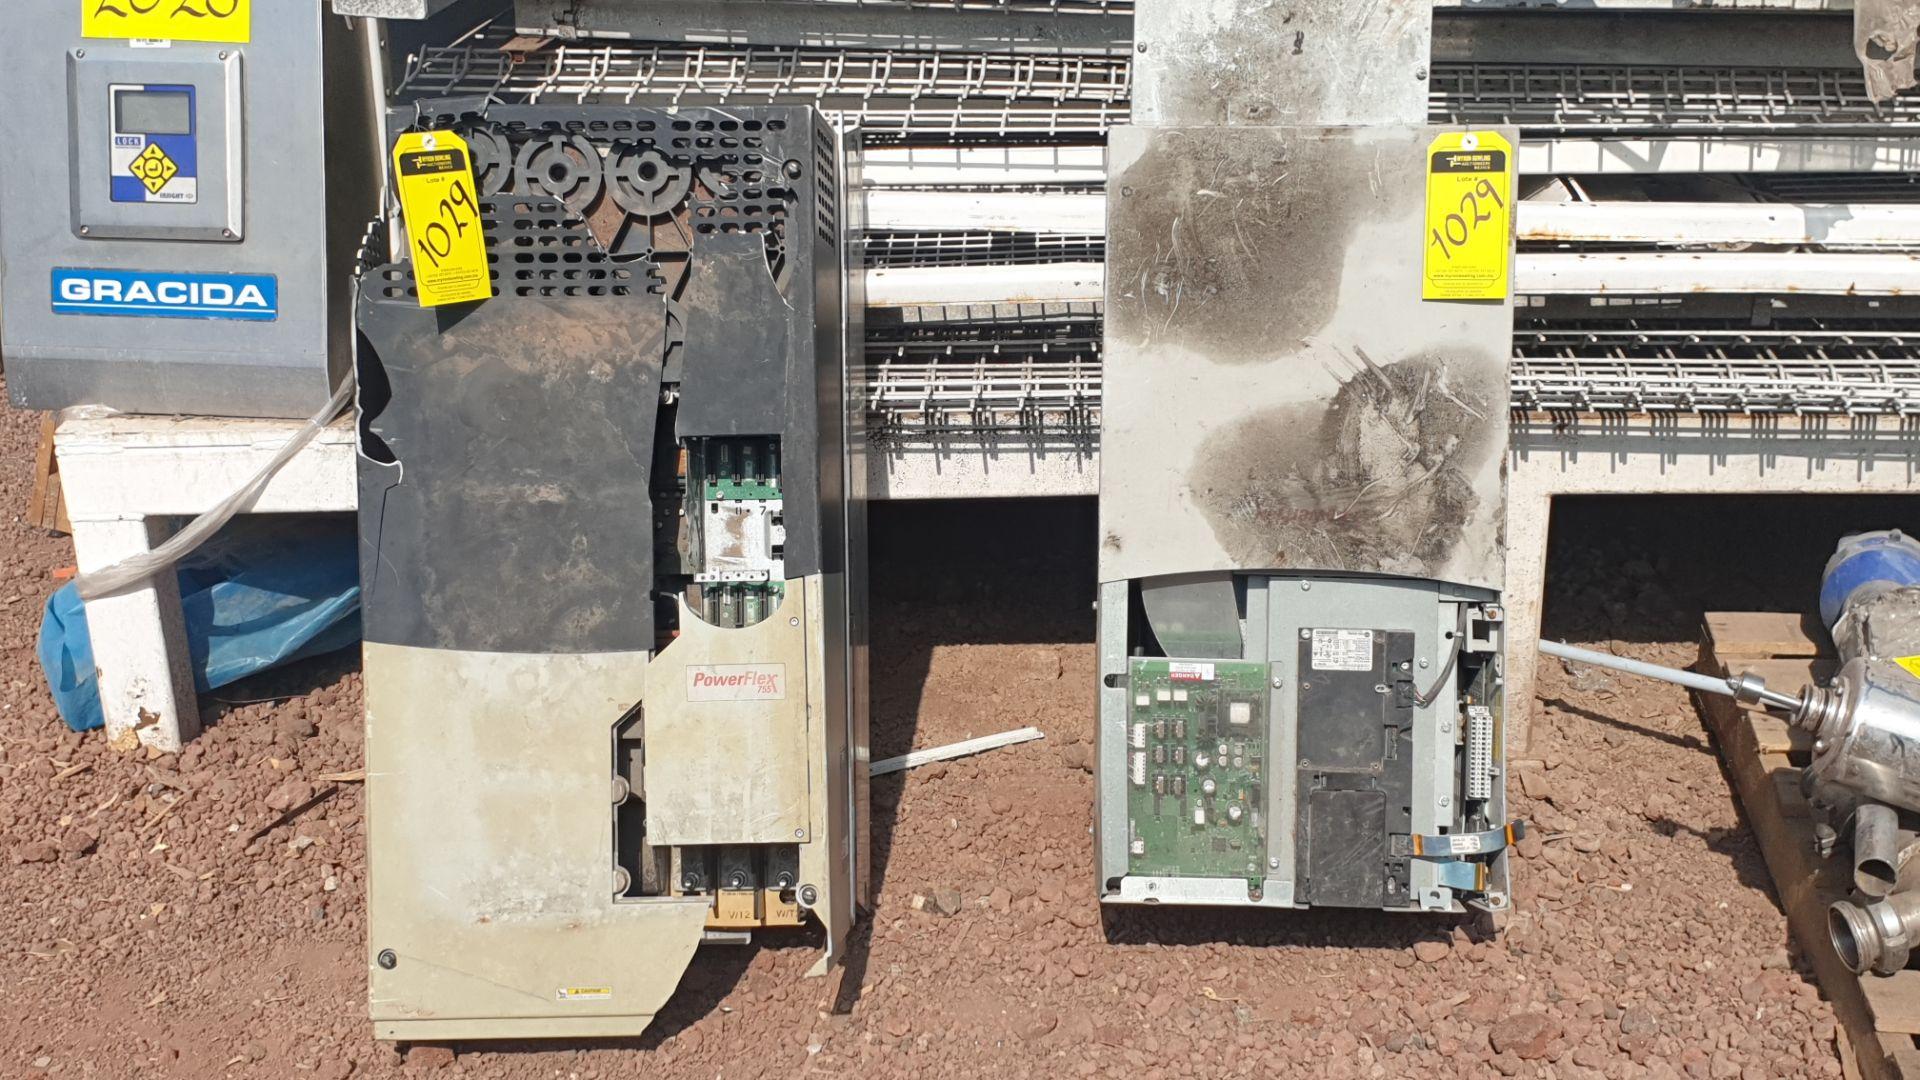 2 Powerflex Variator boards, model 20G1AN, 20BD180A0AYNANC0 - Image 6 of 13